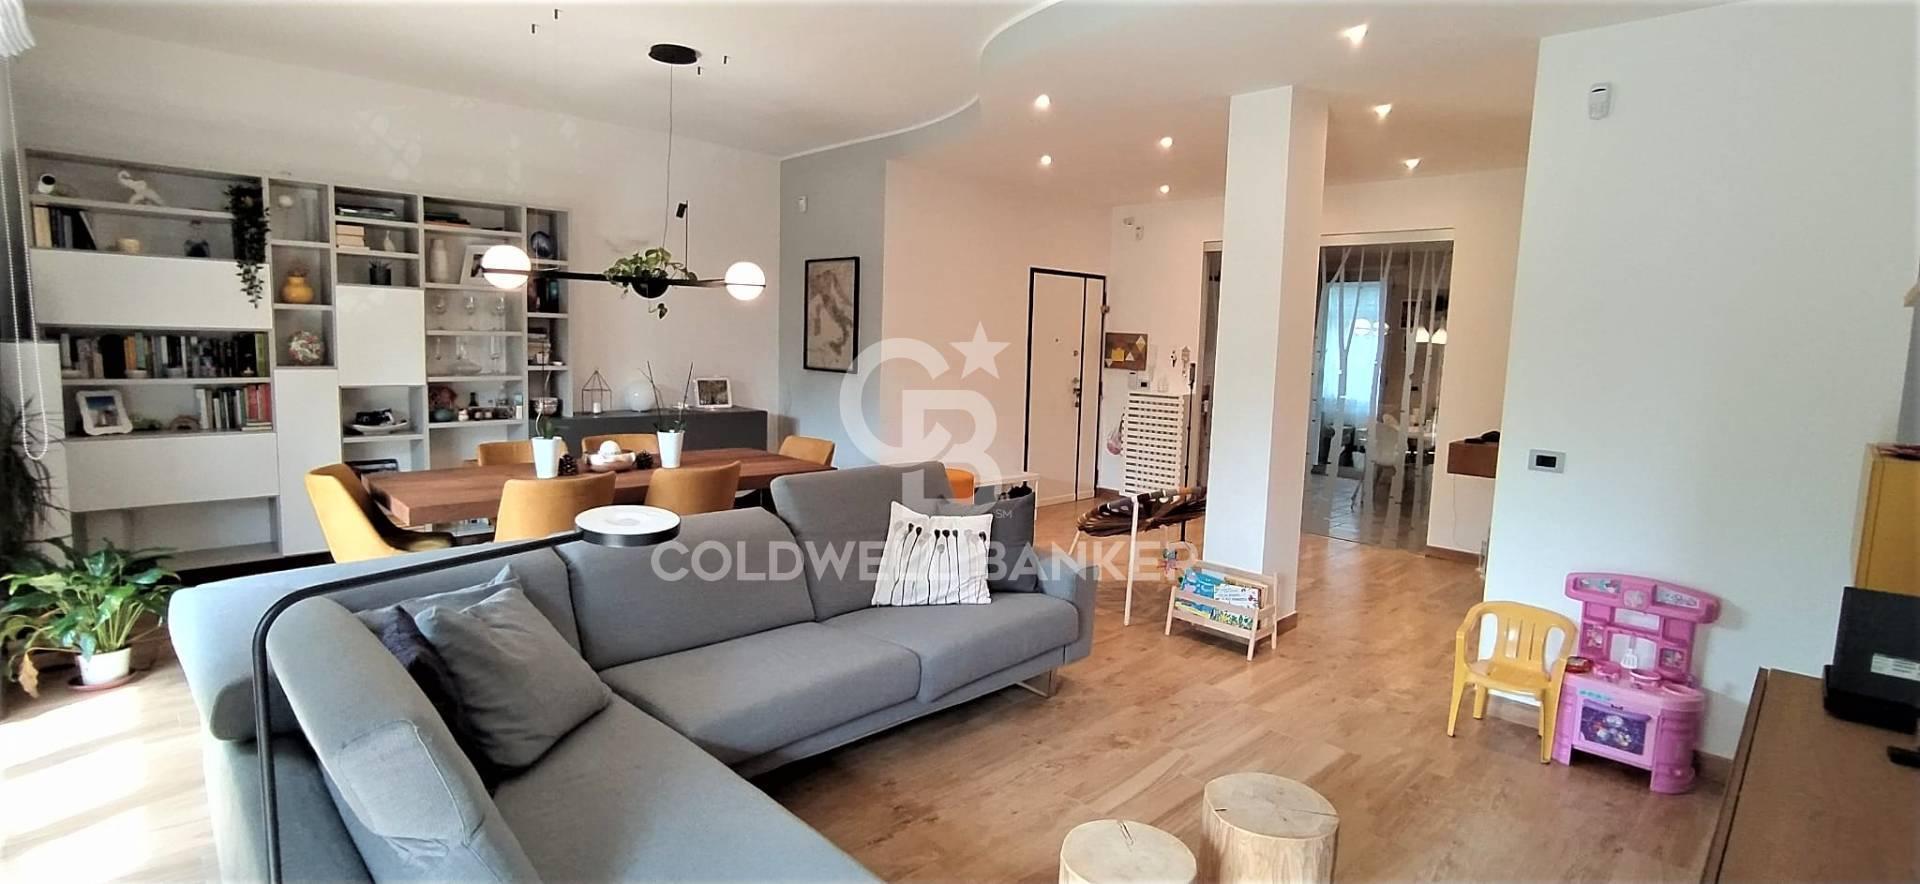 Appartamento in vendita a Japigia, Bari (BA)